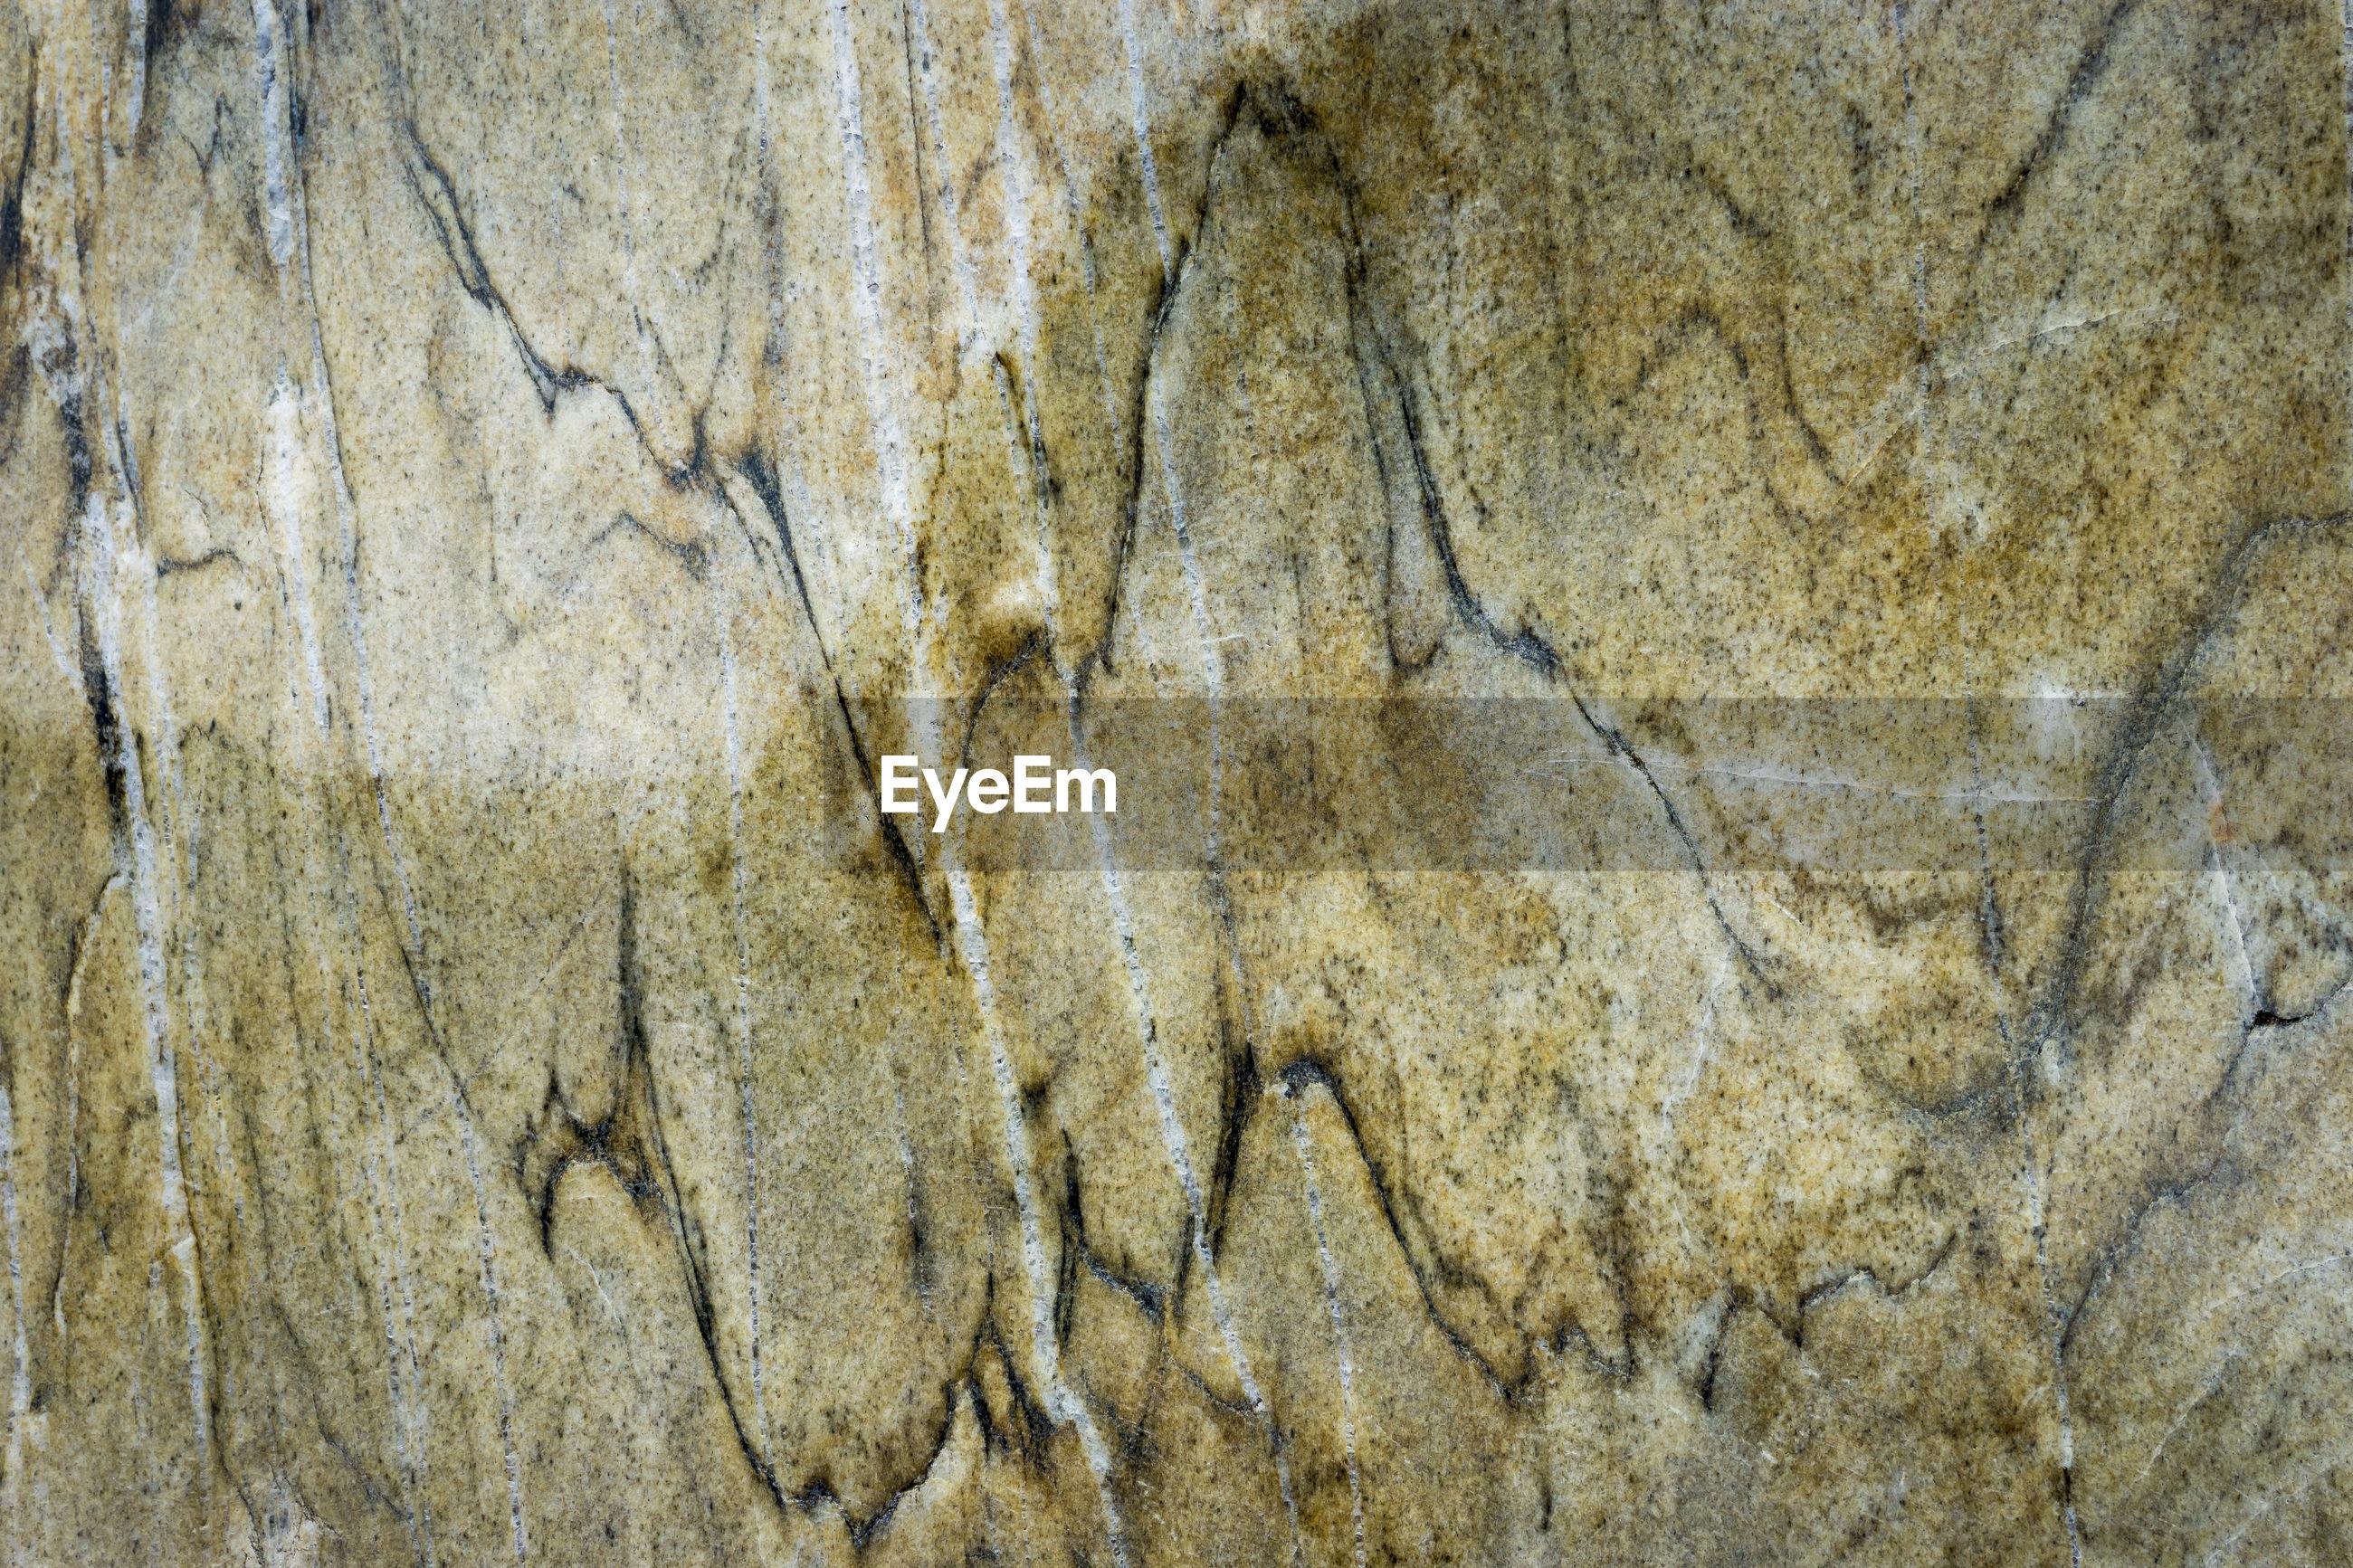 Full frame shot of patterned rock at tiergarten